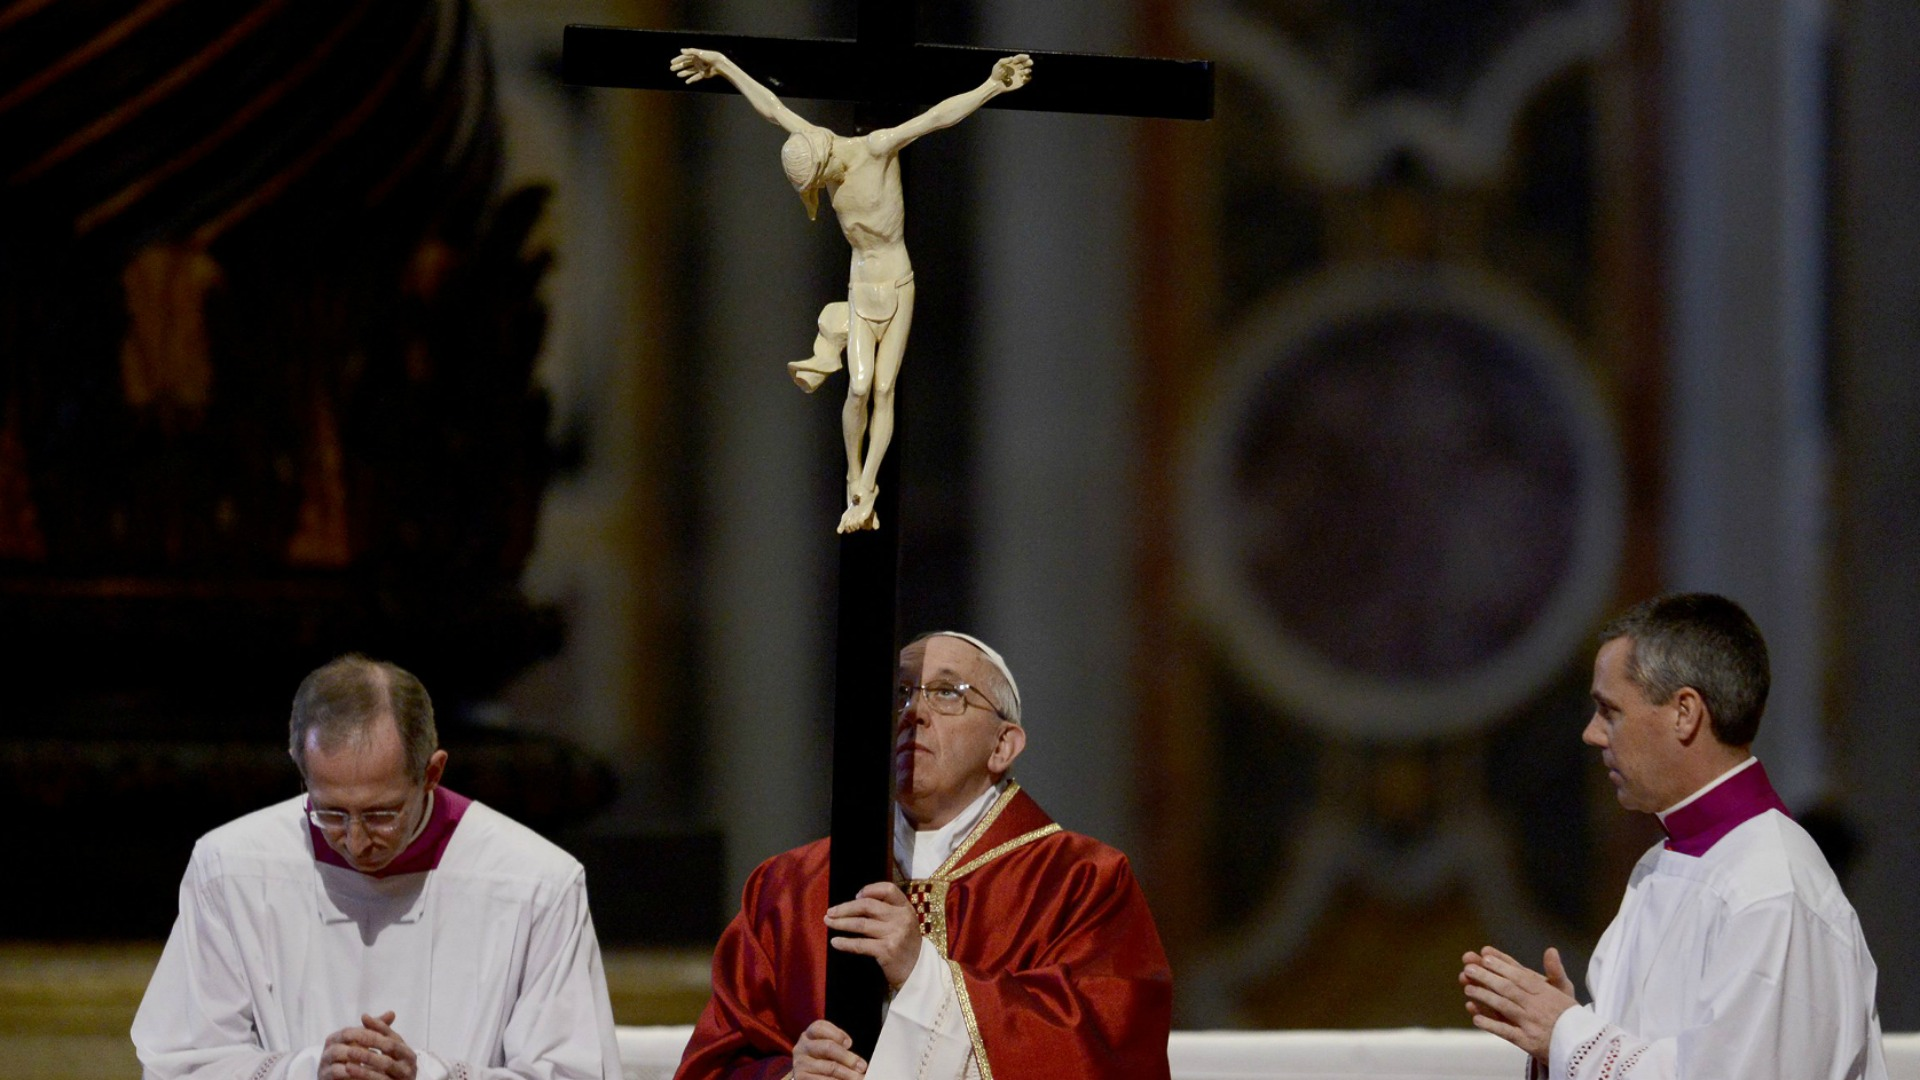 Papst Franziskus hält das Kreuz bei der Karfreitagsliturgie am 3. April 2015 im Petersdom in Rom.